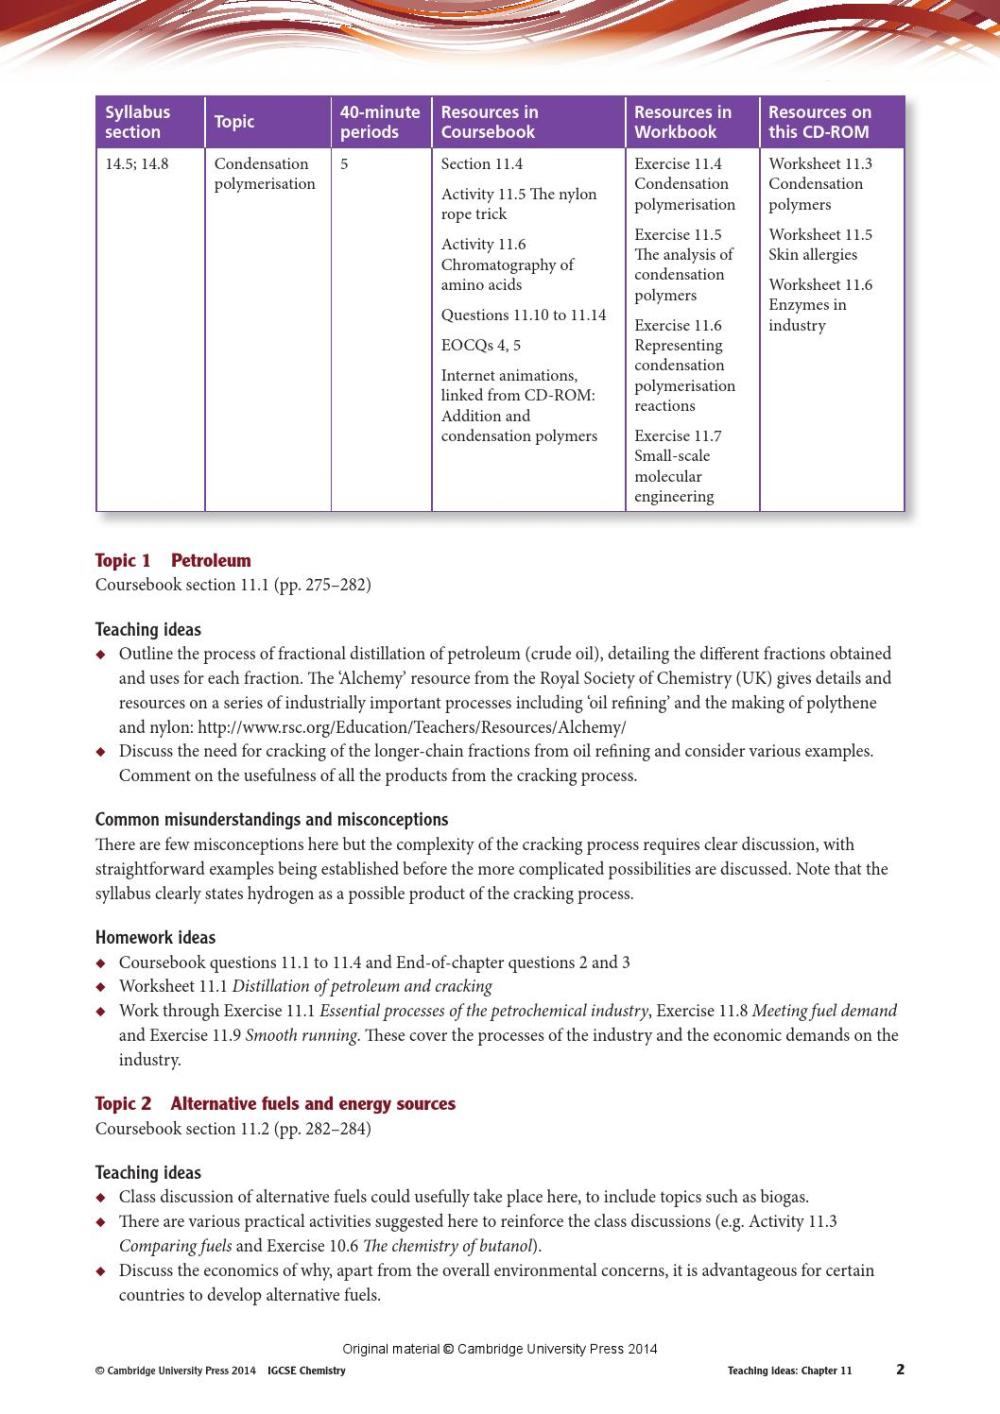 medium resolution of Cambridge IGCSE Chemistry Teacher's Resource (fourth edition) by Cambridge  University Press Education - issuu